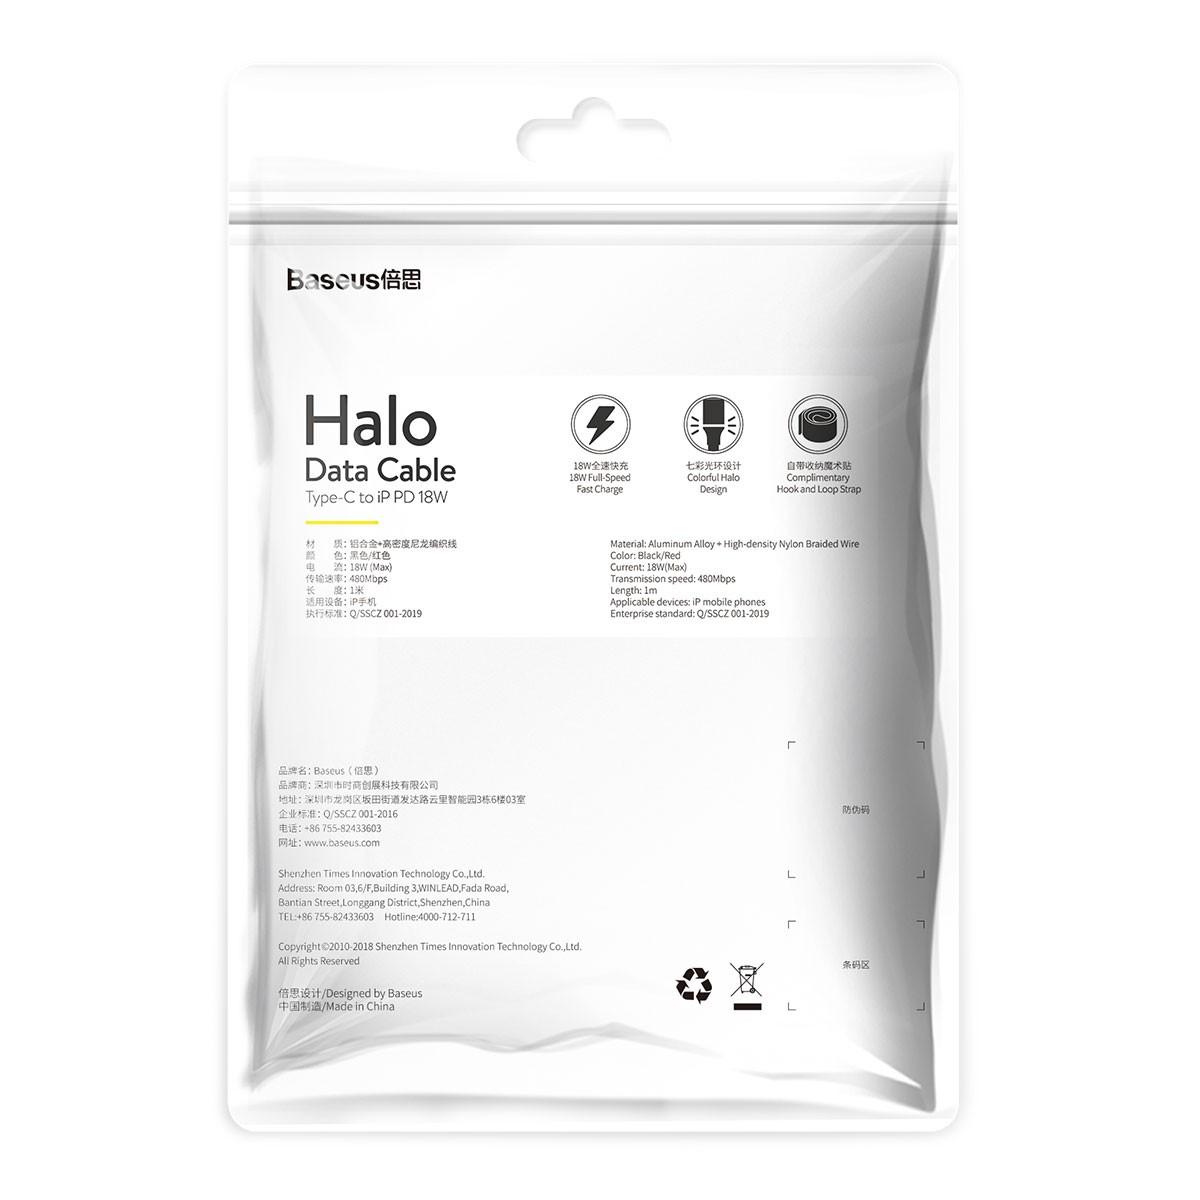 Cabo Baseus Halo usb Type C Pd 18W 1M com LED